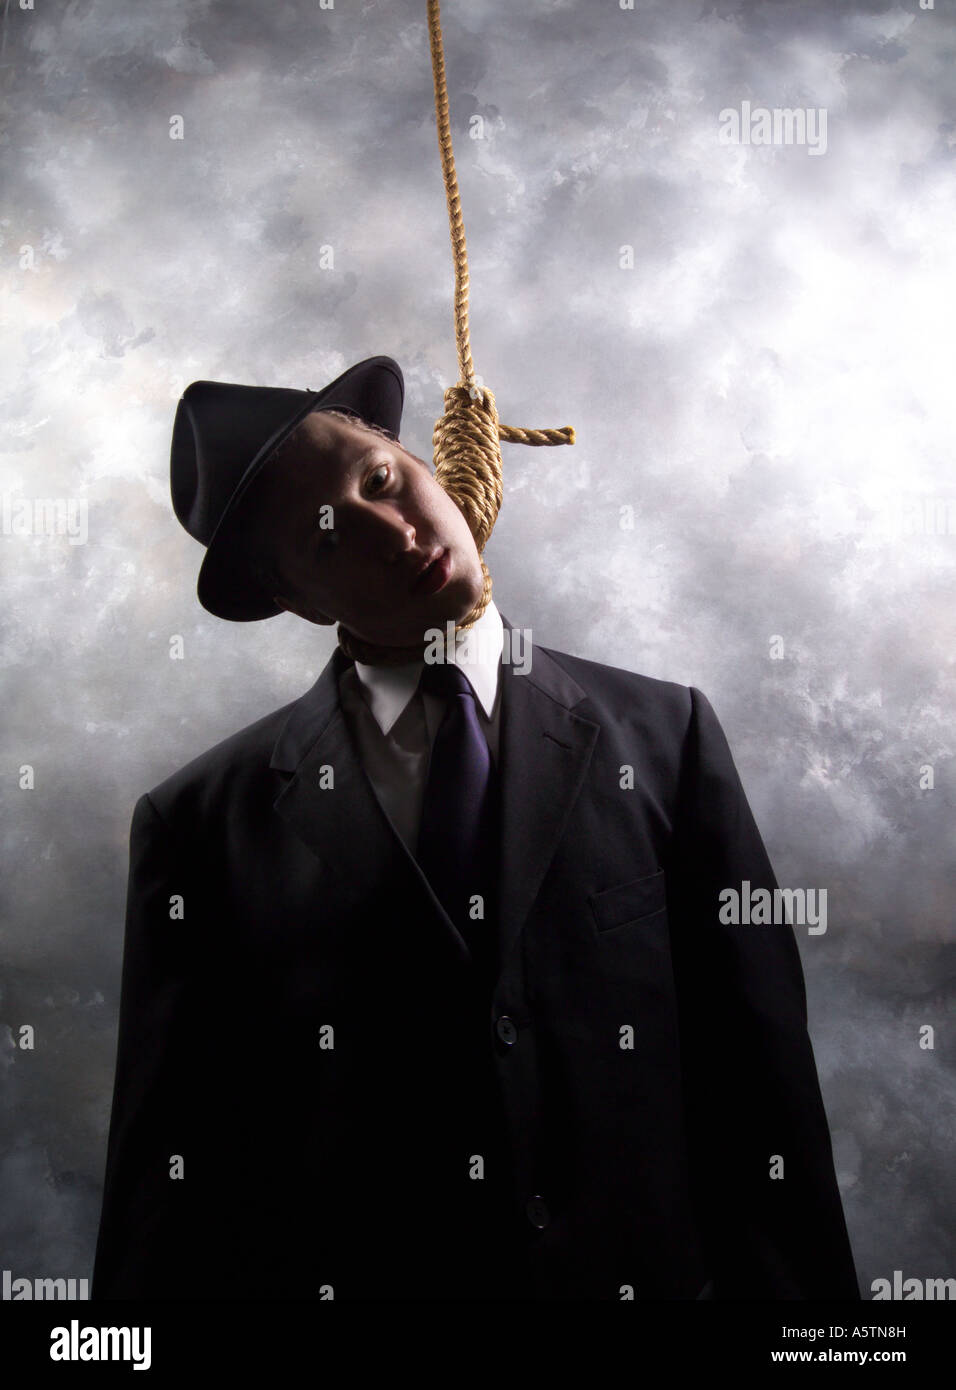 The Hanged Man Predictive Tarot Card Meanings: Hanged Man Stock Photo: 11384560